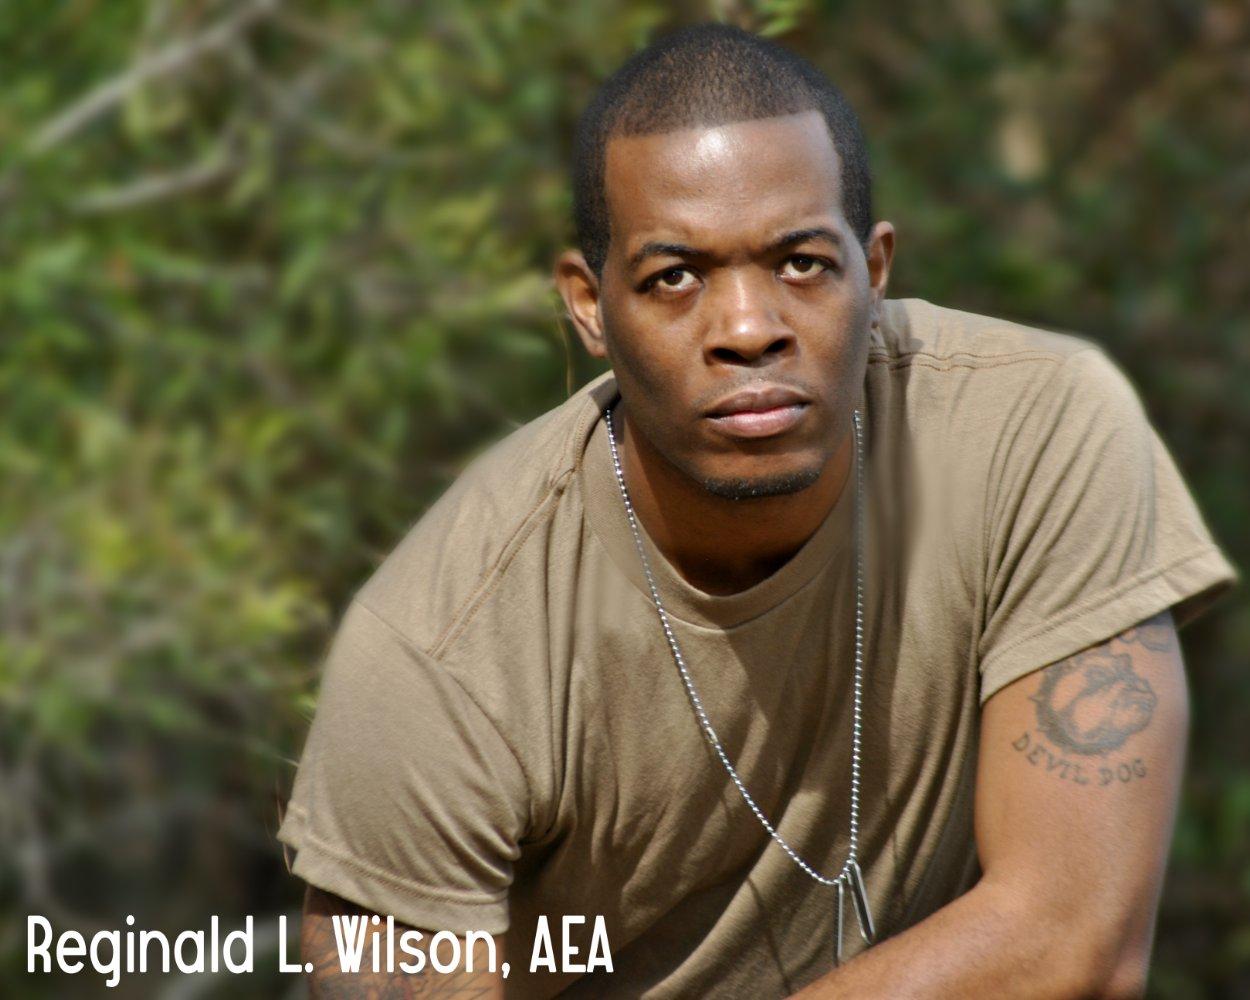 Reginald L. Wilson